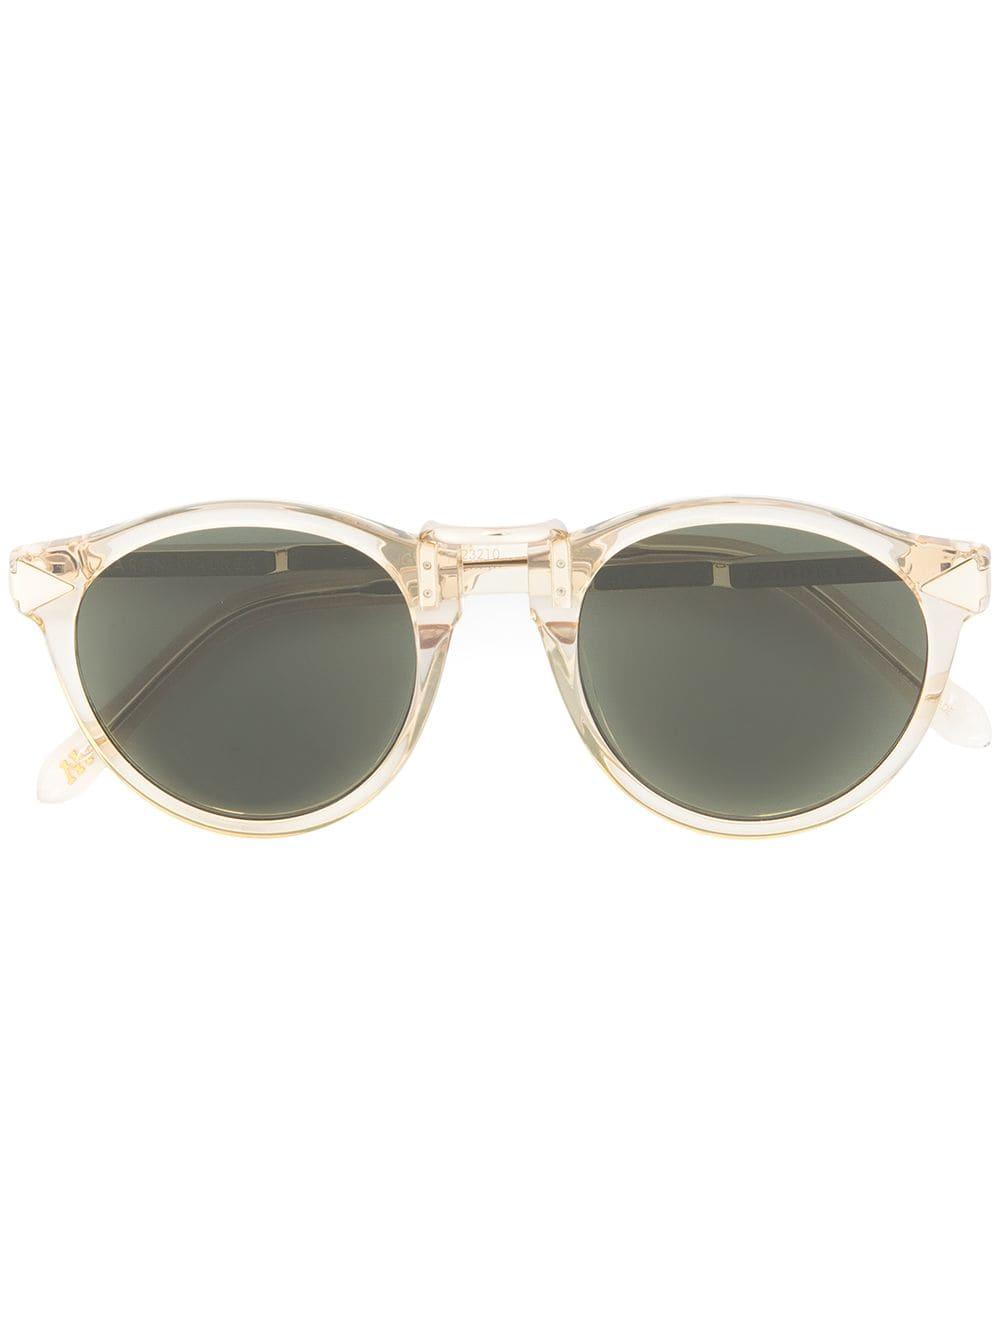 Karen Walker Hemingway sunglasses - Yellow - Glami.hu 43a304854e